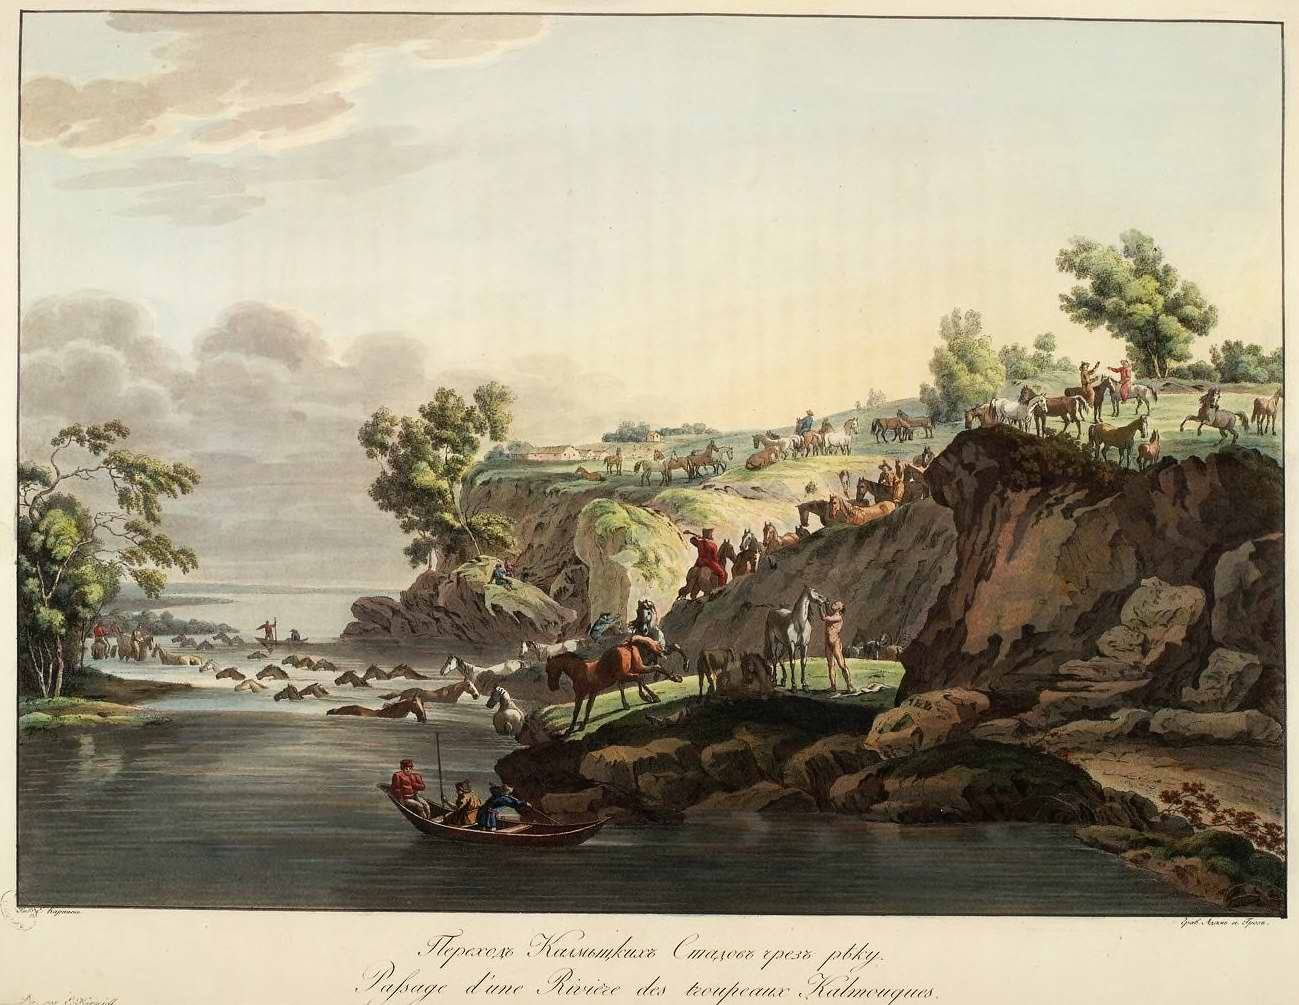 Переход калмыцких стад через реку (1800)